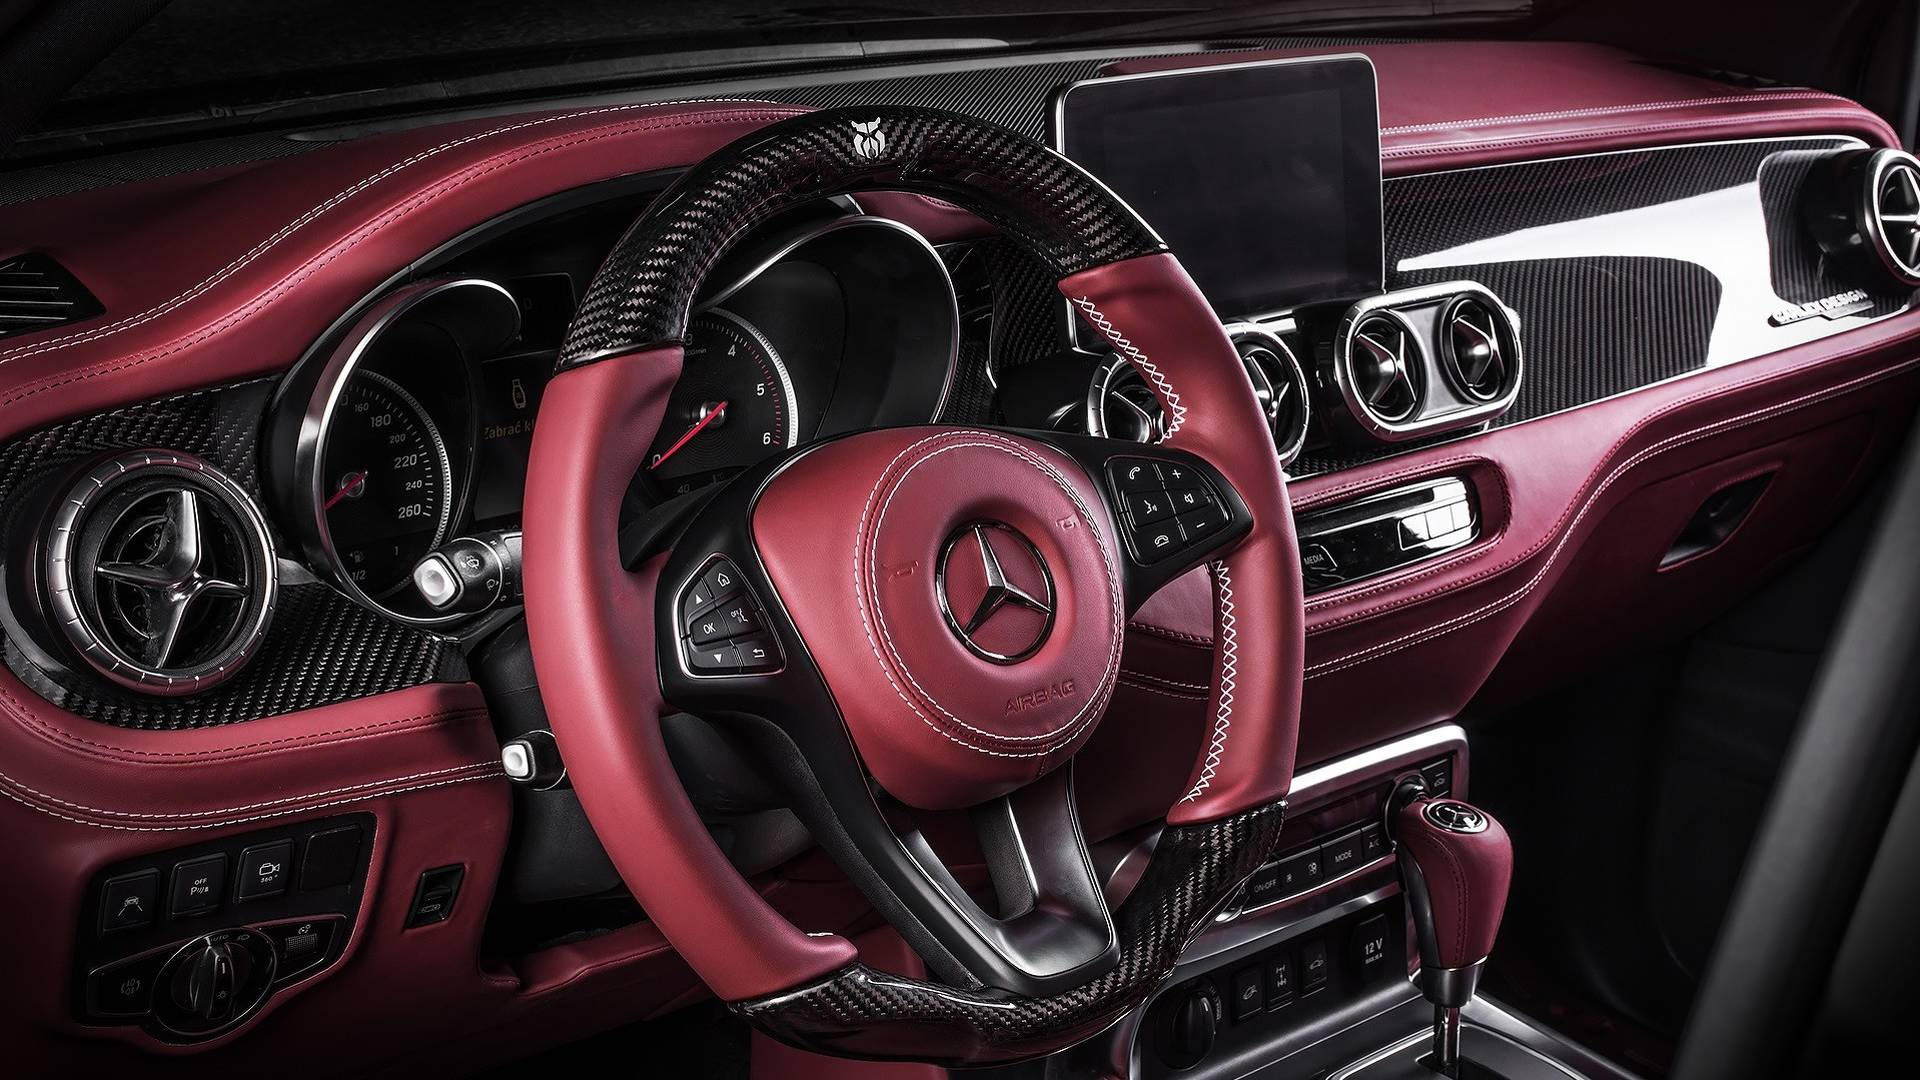 Cool Trucks 2018 >> Mercedes X-Class Gets Pickup Design Body Kit and Carlex Luxury Interior - autoevolution